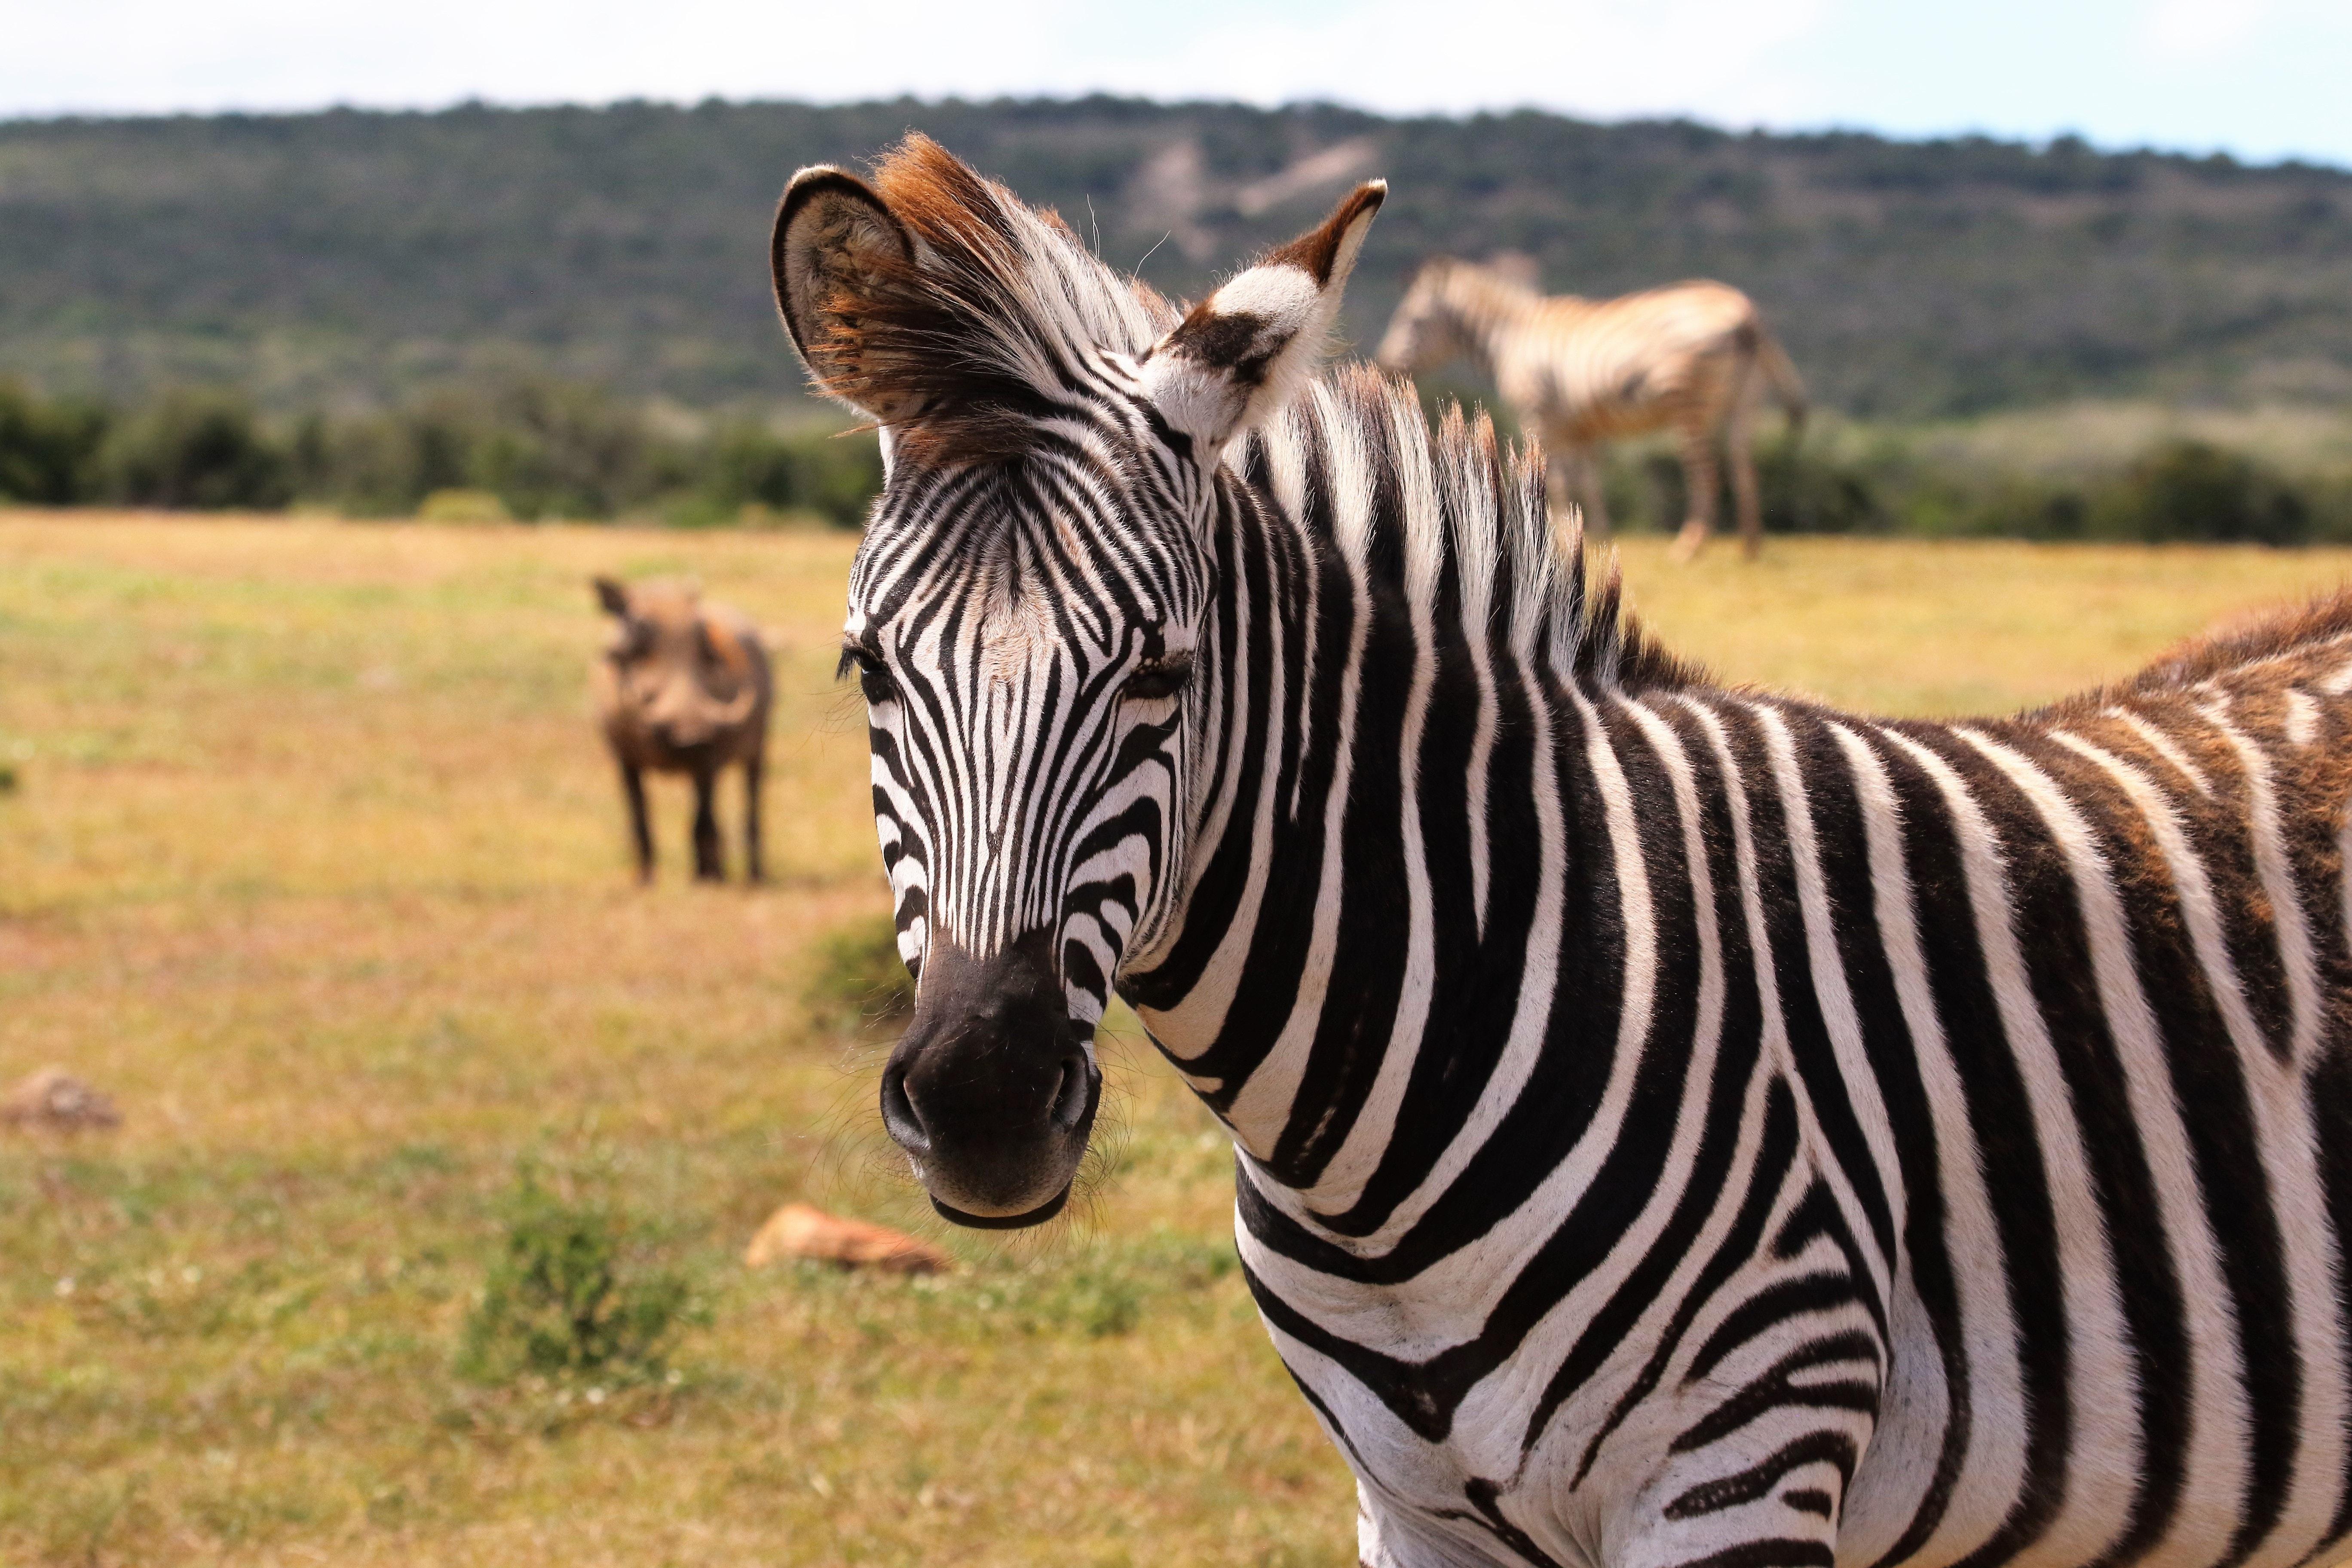 Zebra on green grass field photo